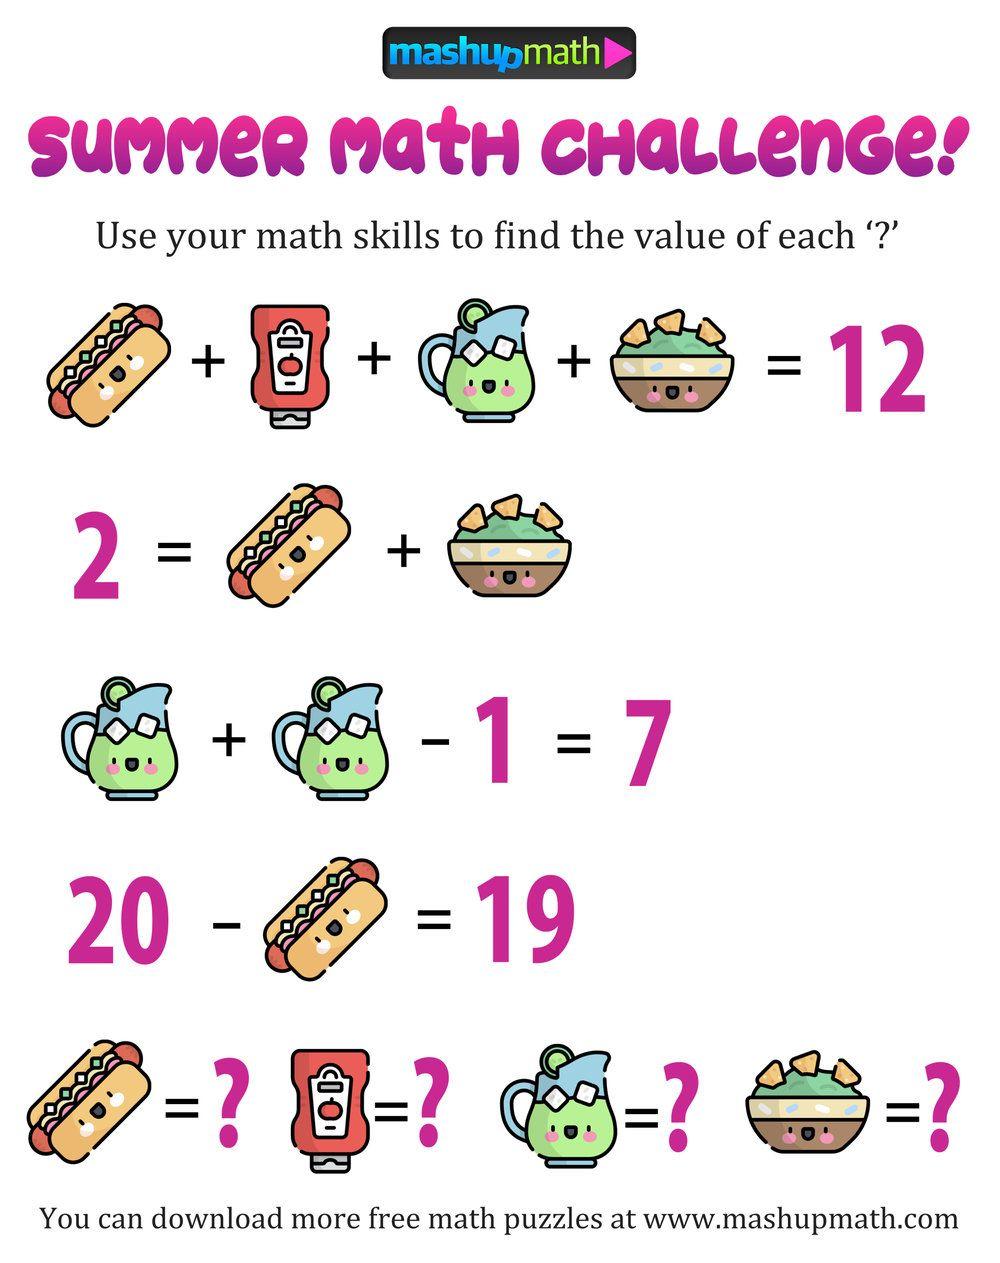 Maths Puzzles Math Brainteasers Math Logic Puzzles [ 1263 x 1000 Pixel ]